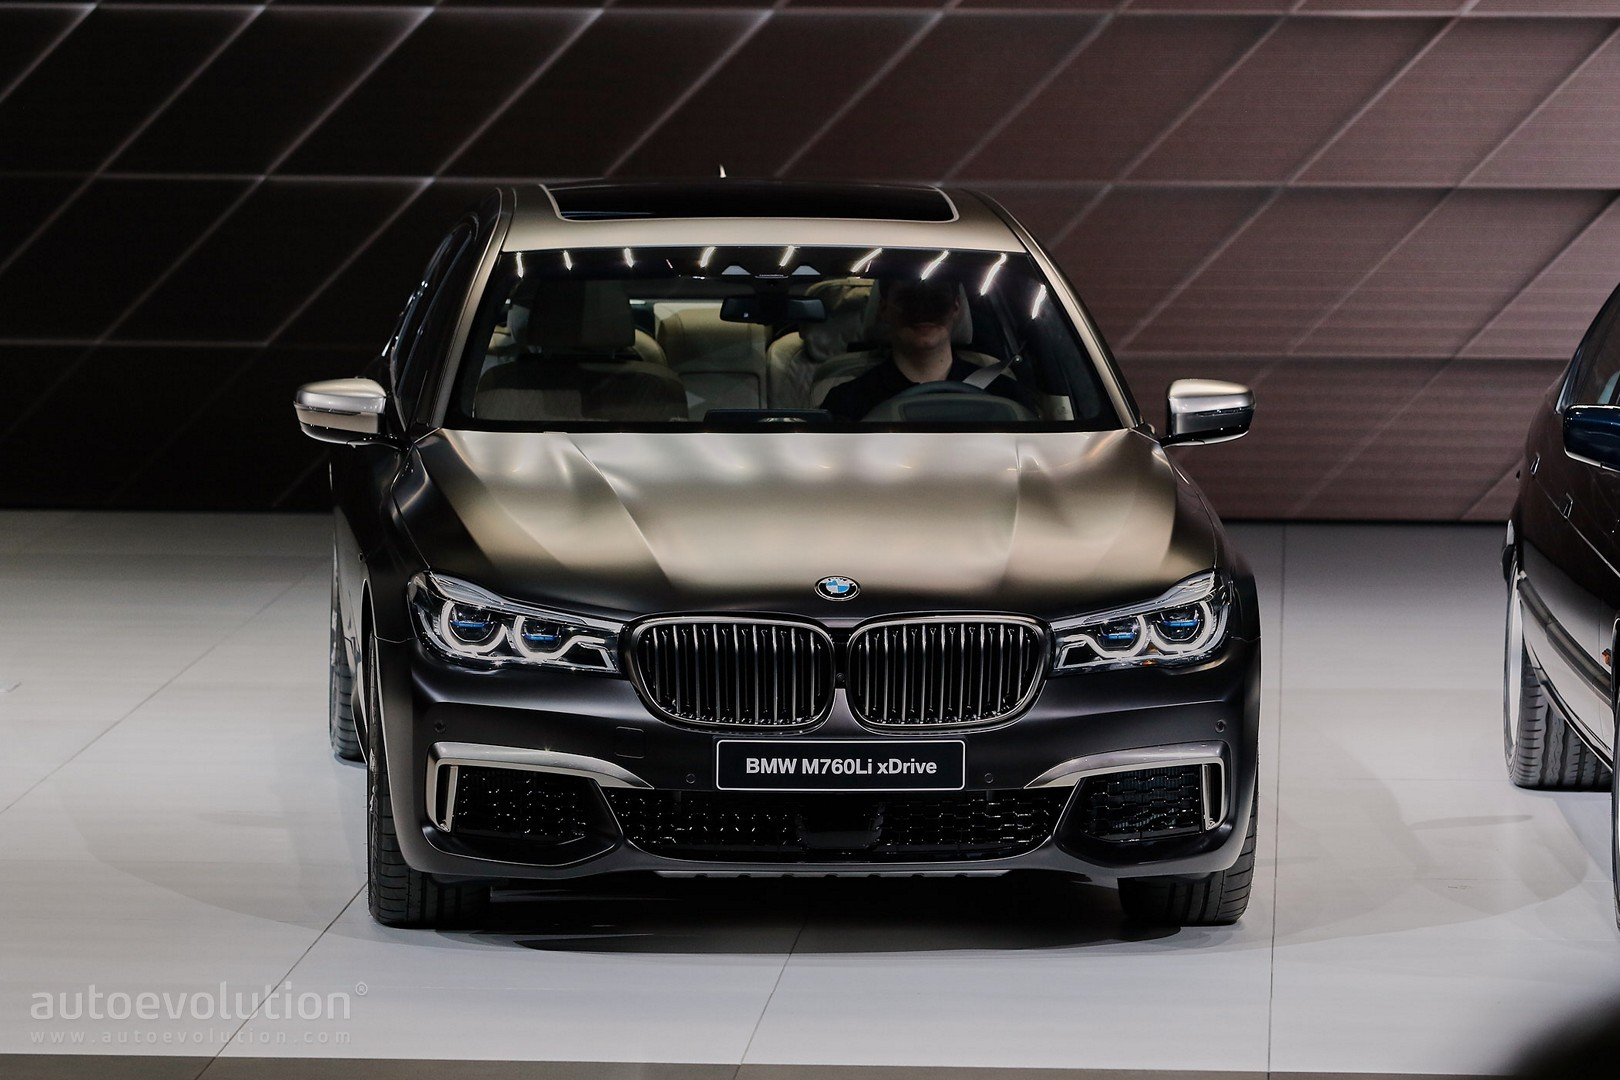 Alpina B7 2017 >> 2017 BMW M760Li xDrive Gets 10 Extra HP As It Chases the Alpina B7 in Geneva - autoevolution